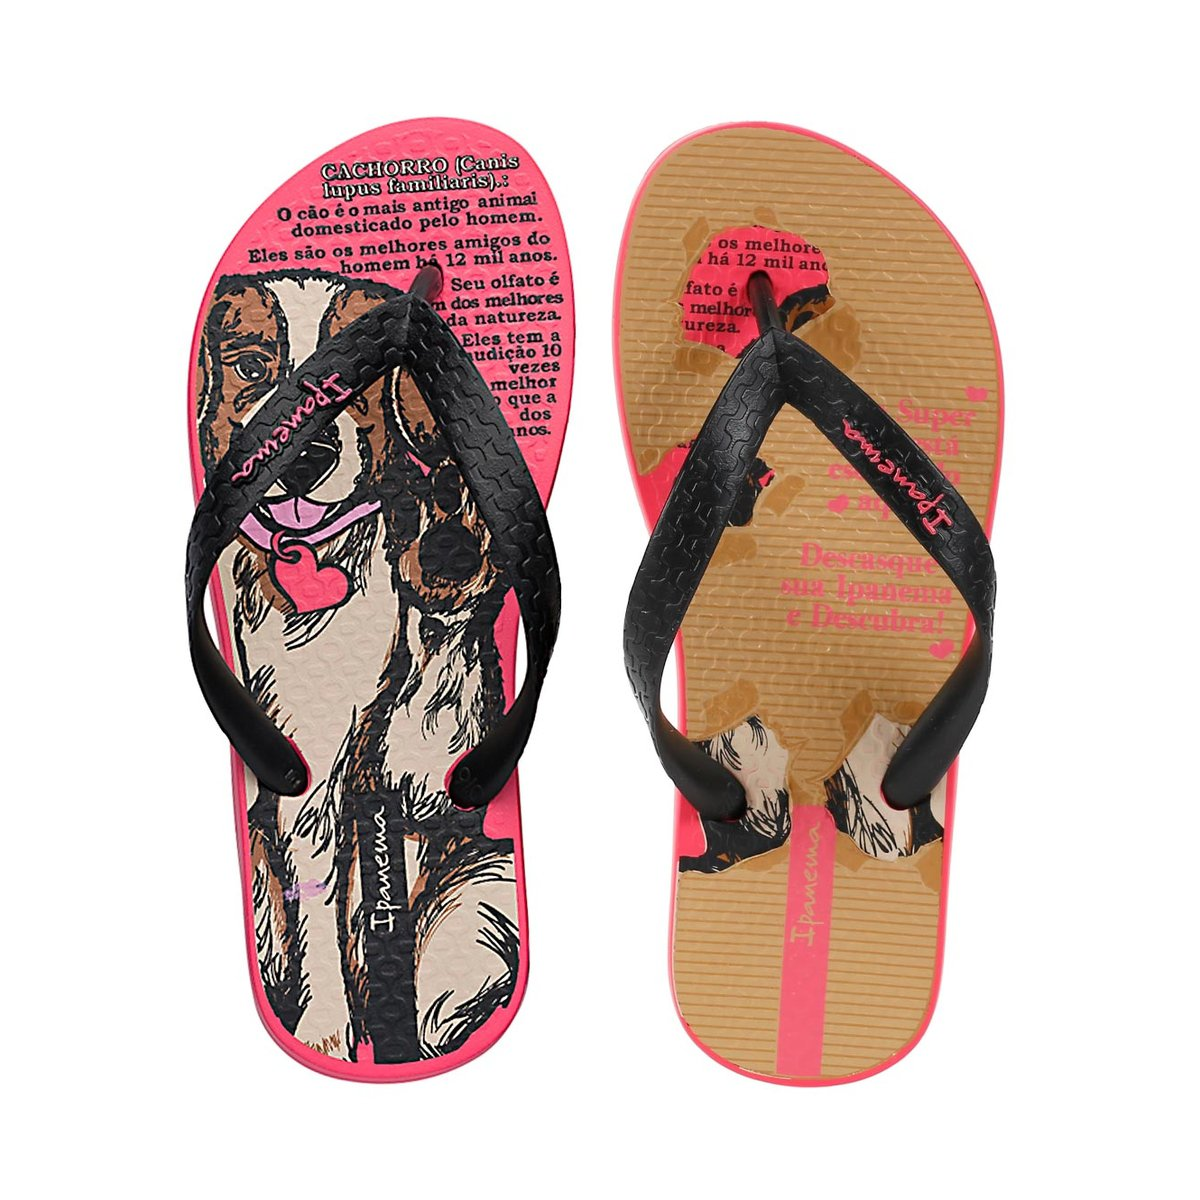 d2412ac4f5 Chinelo Infantil Para Menina Ipanema - Rosa pink preto - Compre Agora